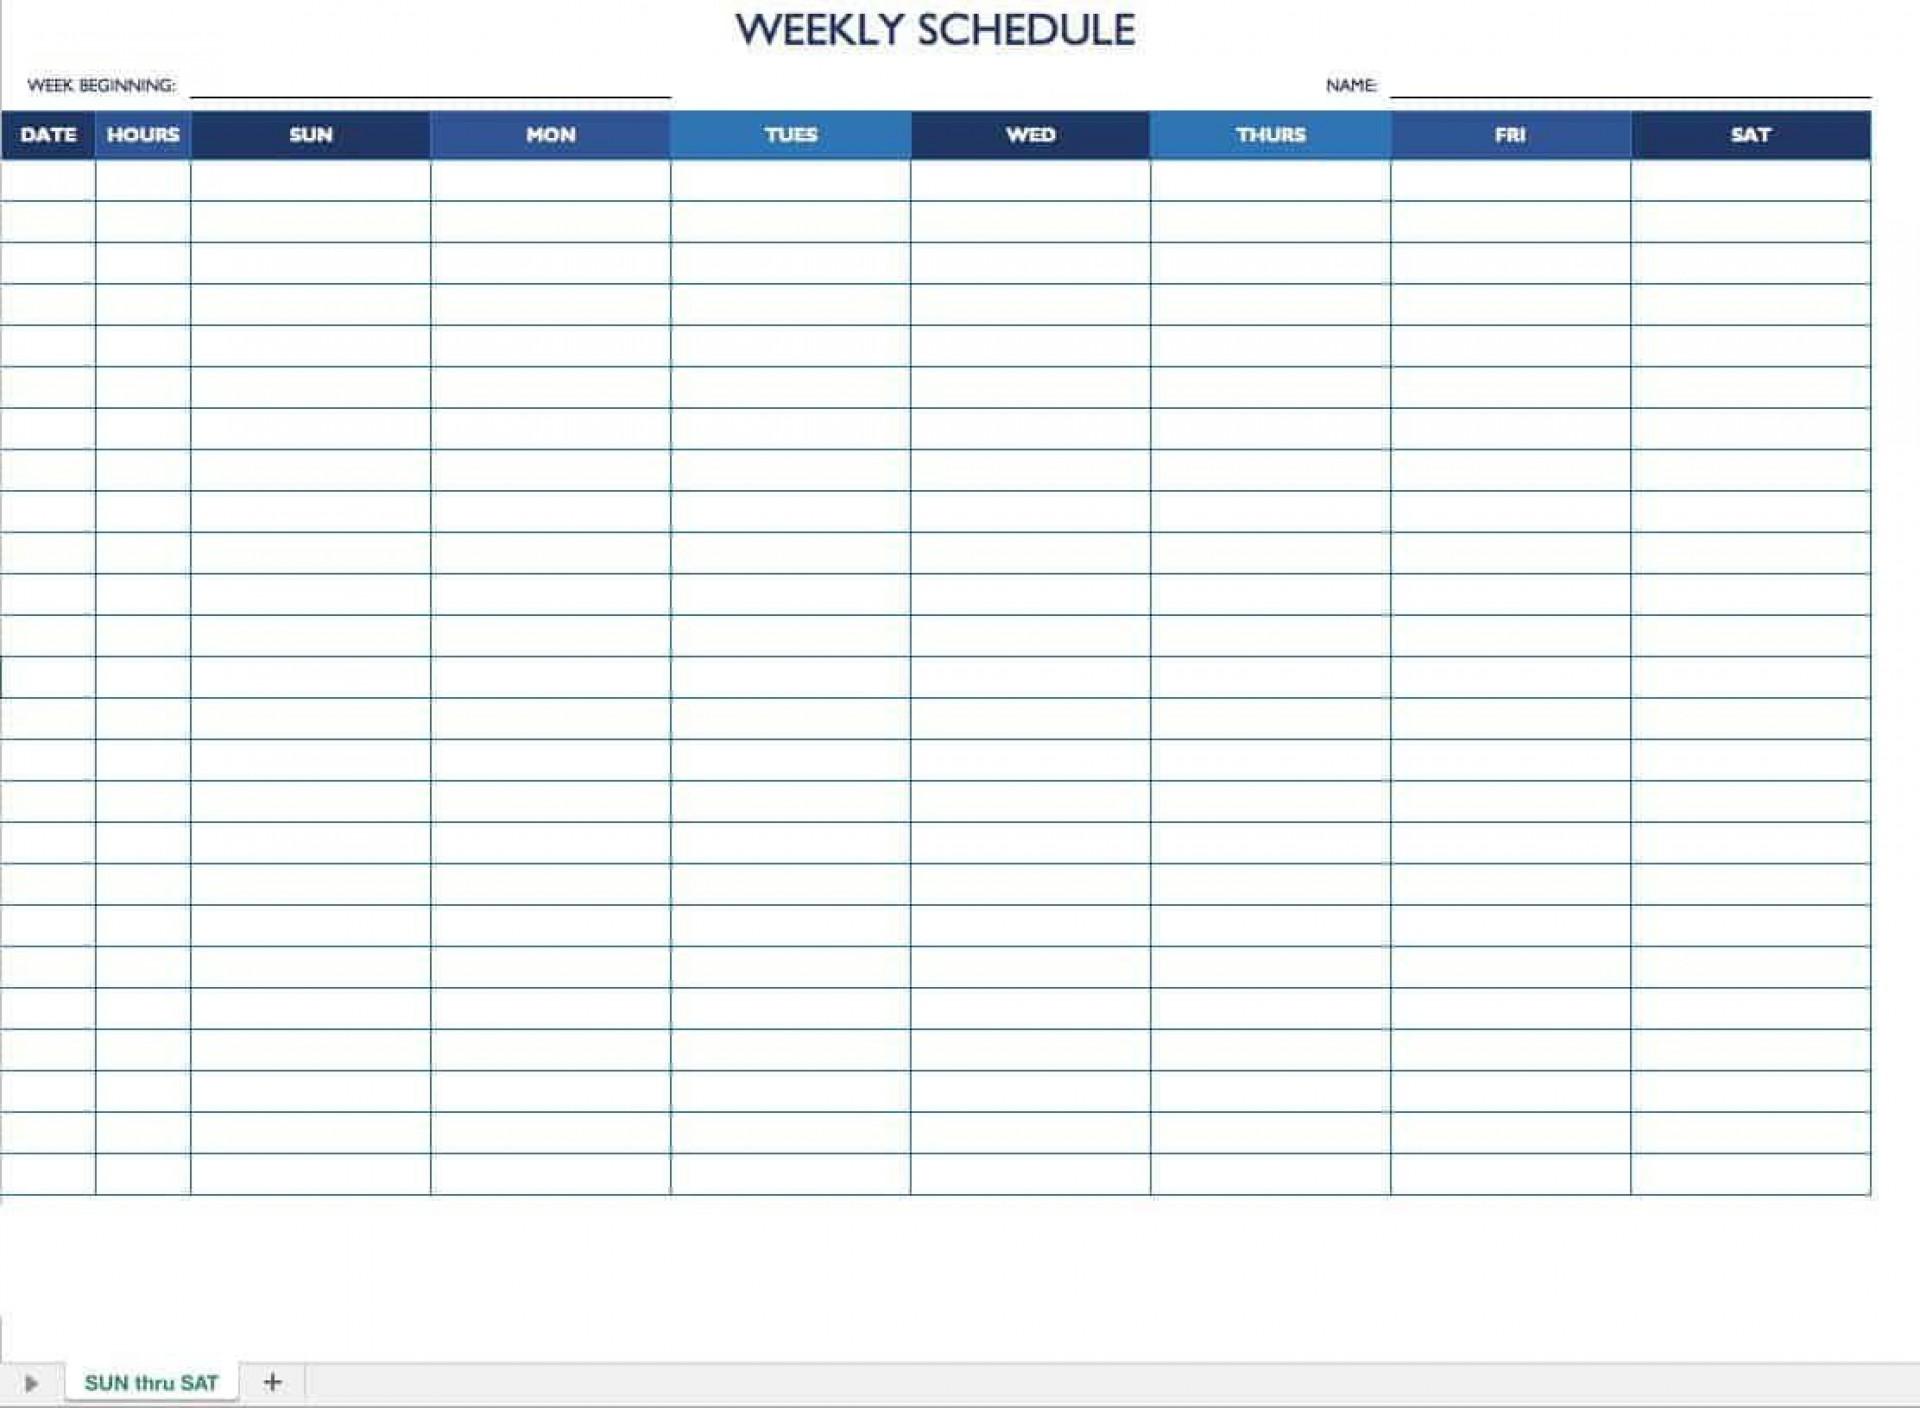 009 Surprising 24 Hr Schedule Template Design  Hour Excel Shift Work1920